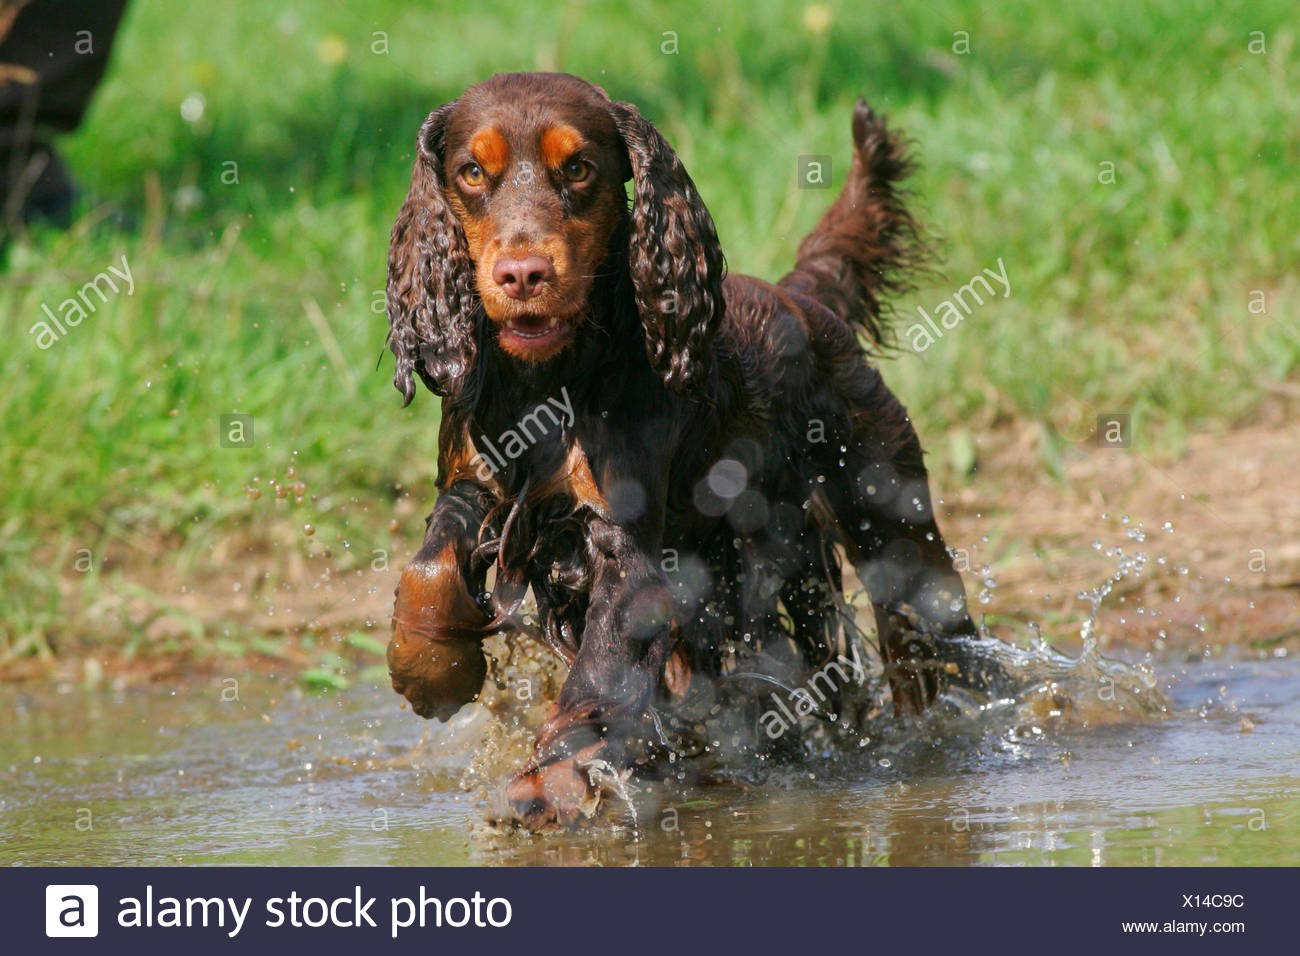 English Cocker Spaniel Adult running water Germany - Stock Image